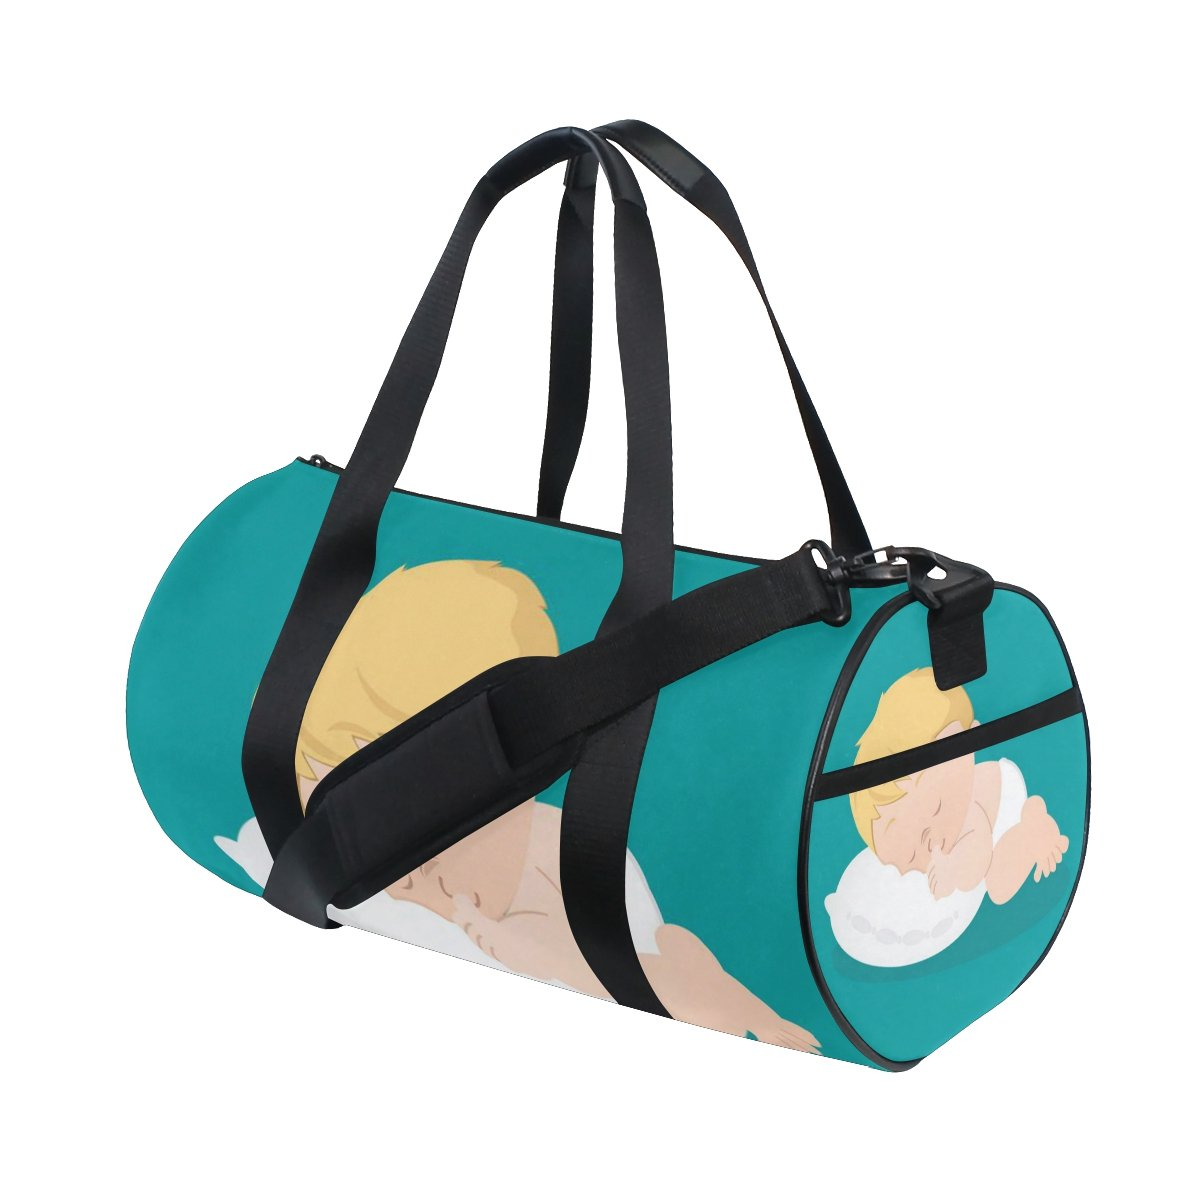 JIUMEI Anime Cartoon Cute Sleeping Baby Canvas Sports Bag Travel Duffel Yoga Gym Bags